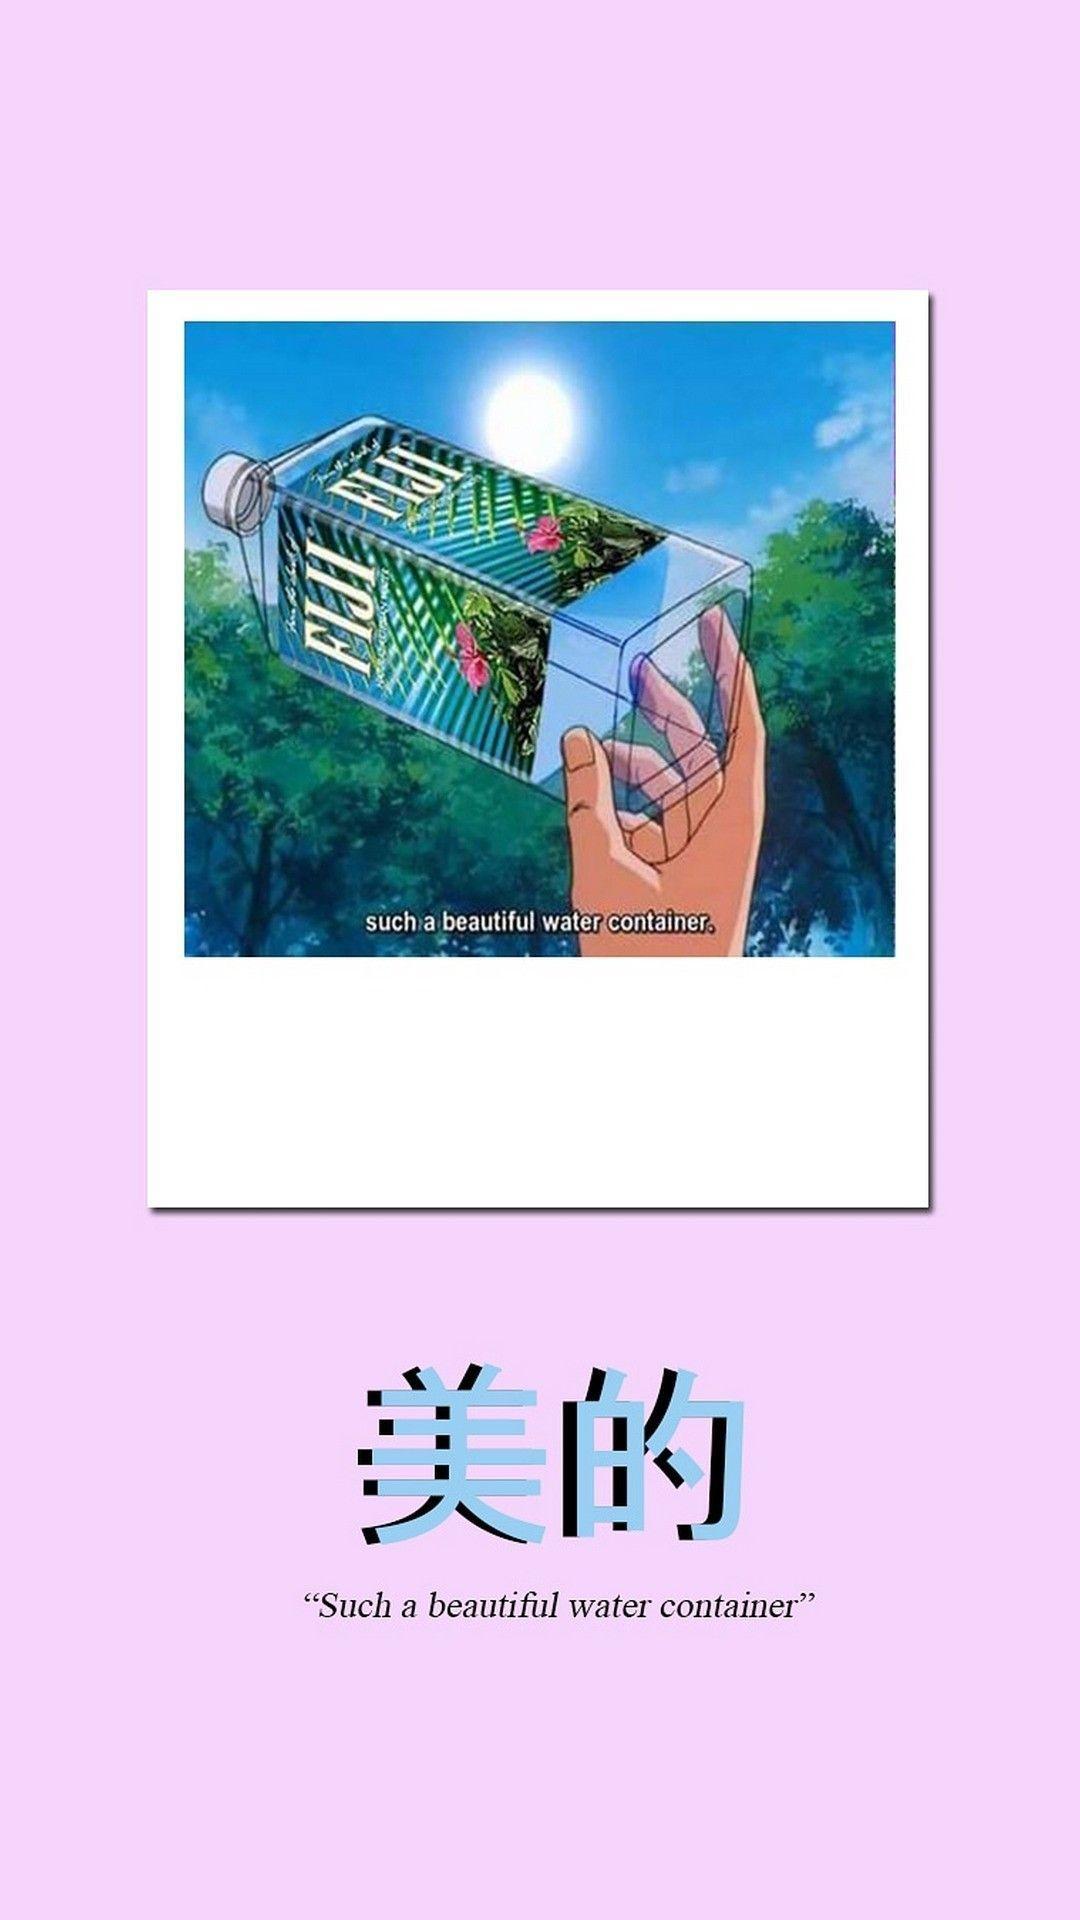 Most Best Retro Anime Wallpaper Iphone 80s Wallpapers La Tert In 2020 Anime Wallpaper Iphone Vaporwave Wallpaper Aesthetic Iphone Wallpaper